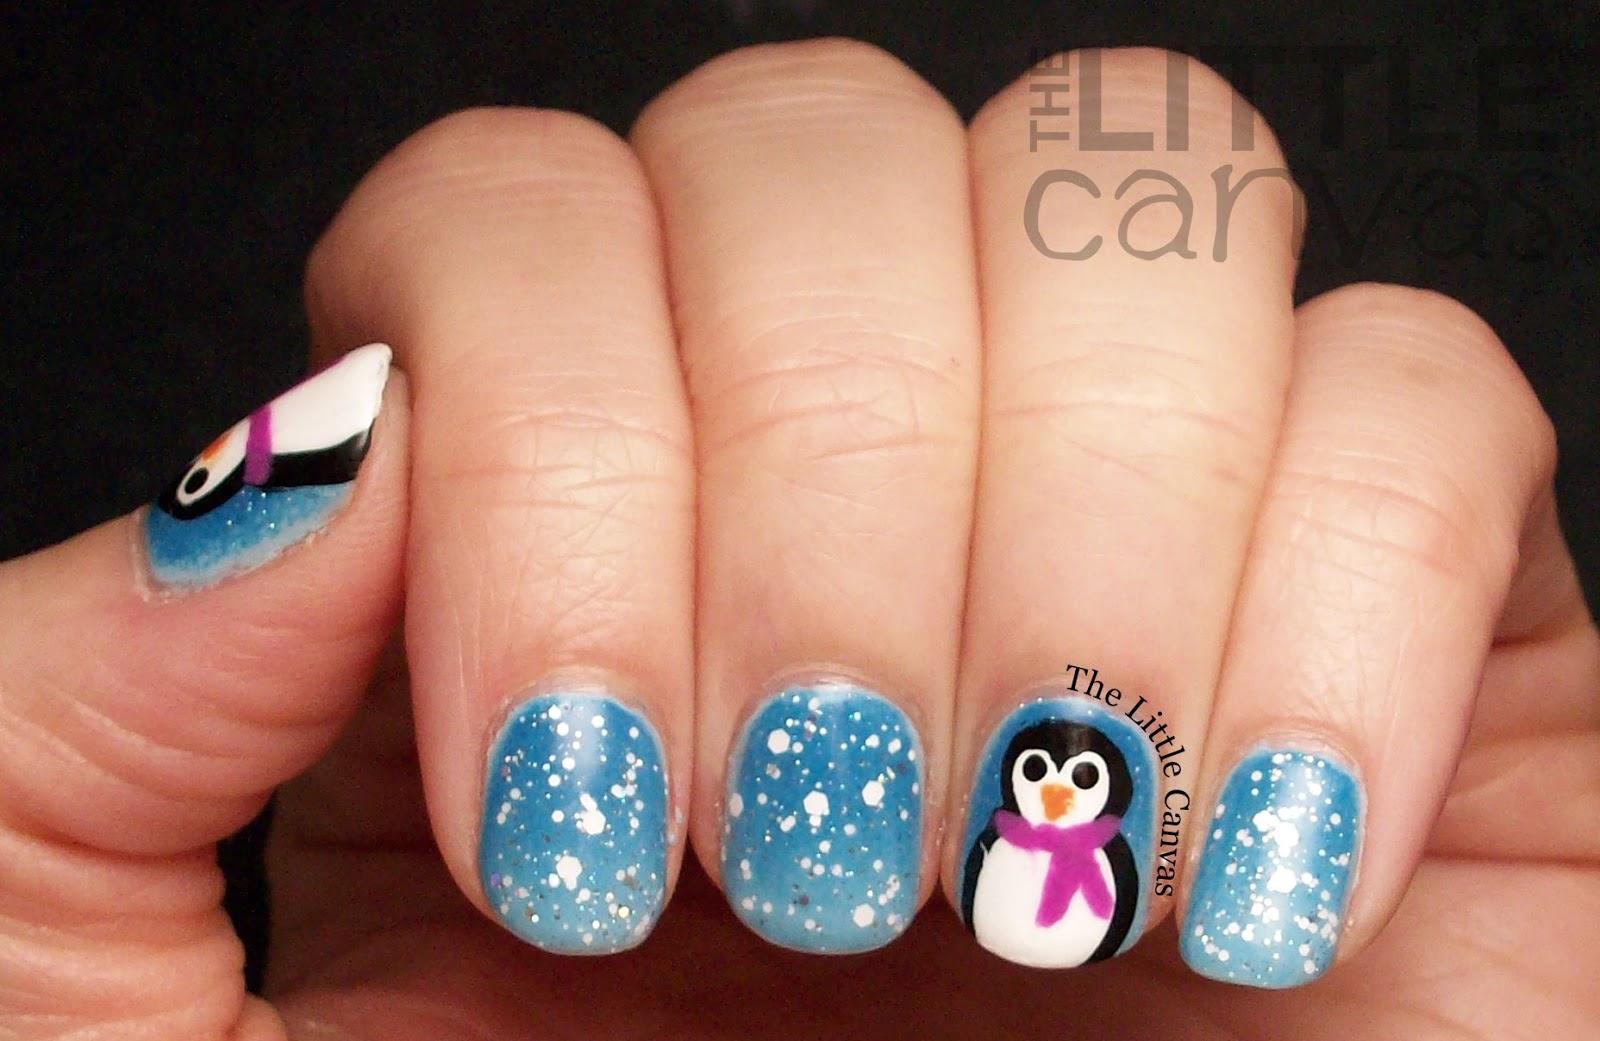 Amazing penguin nail art!